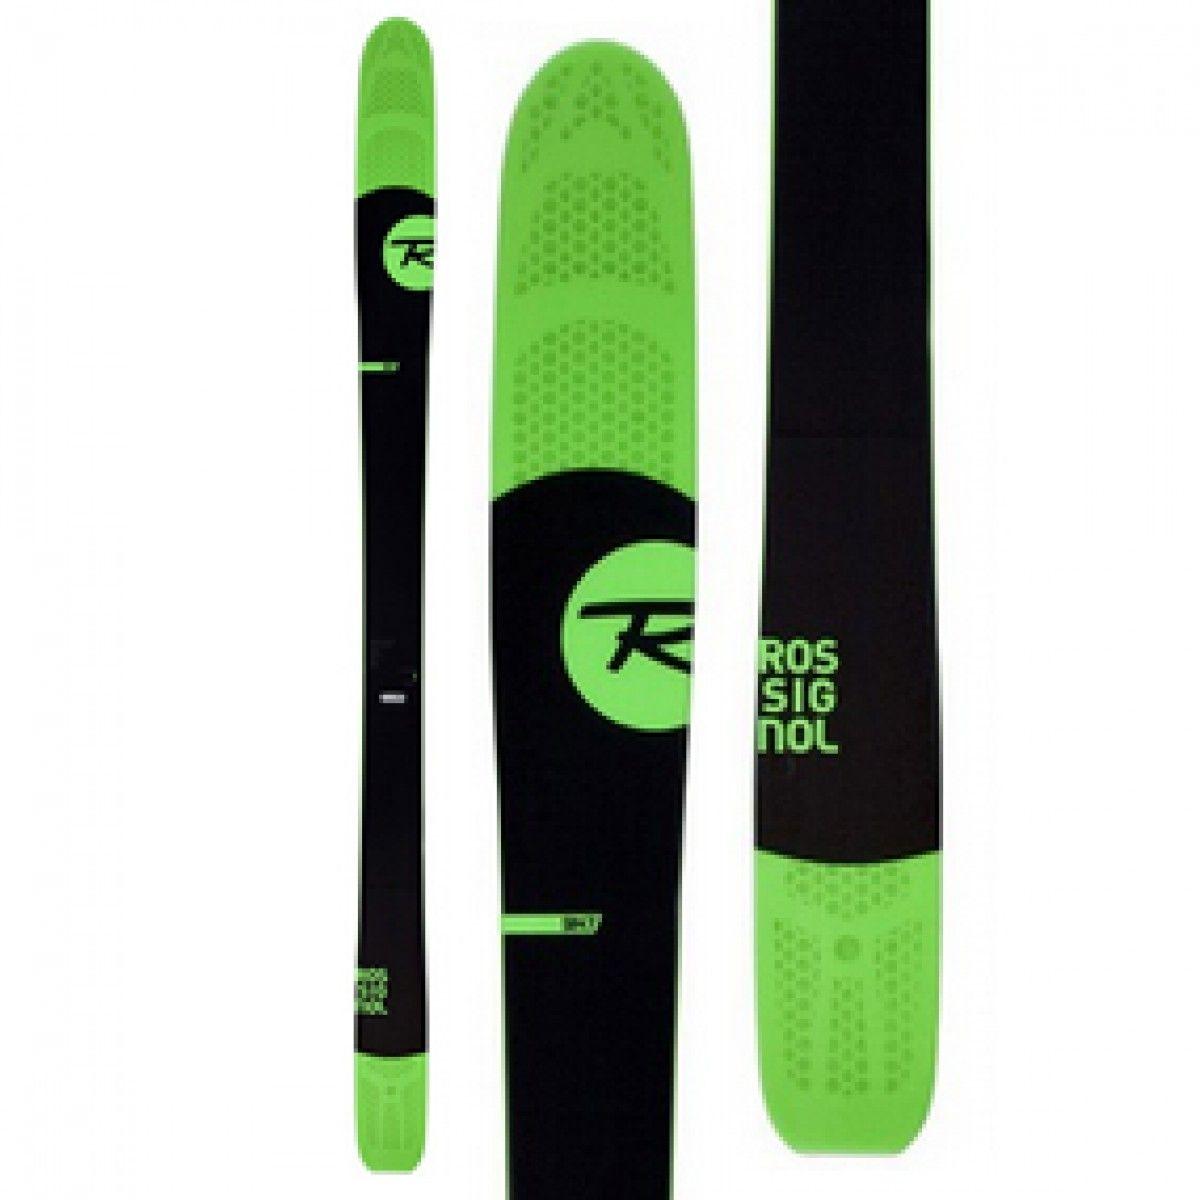 Rossignol Sin 7 Skis 15 16 Golf Ski Warehouse Skiing Mens Skis Sins